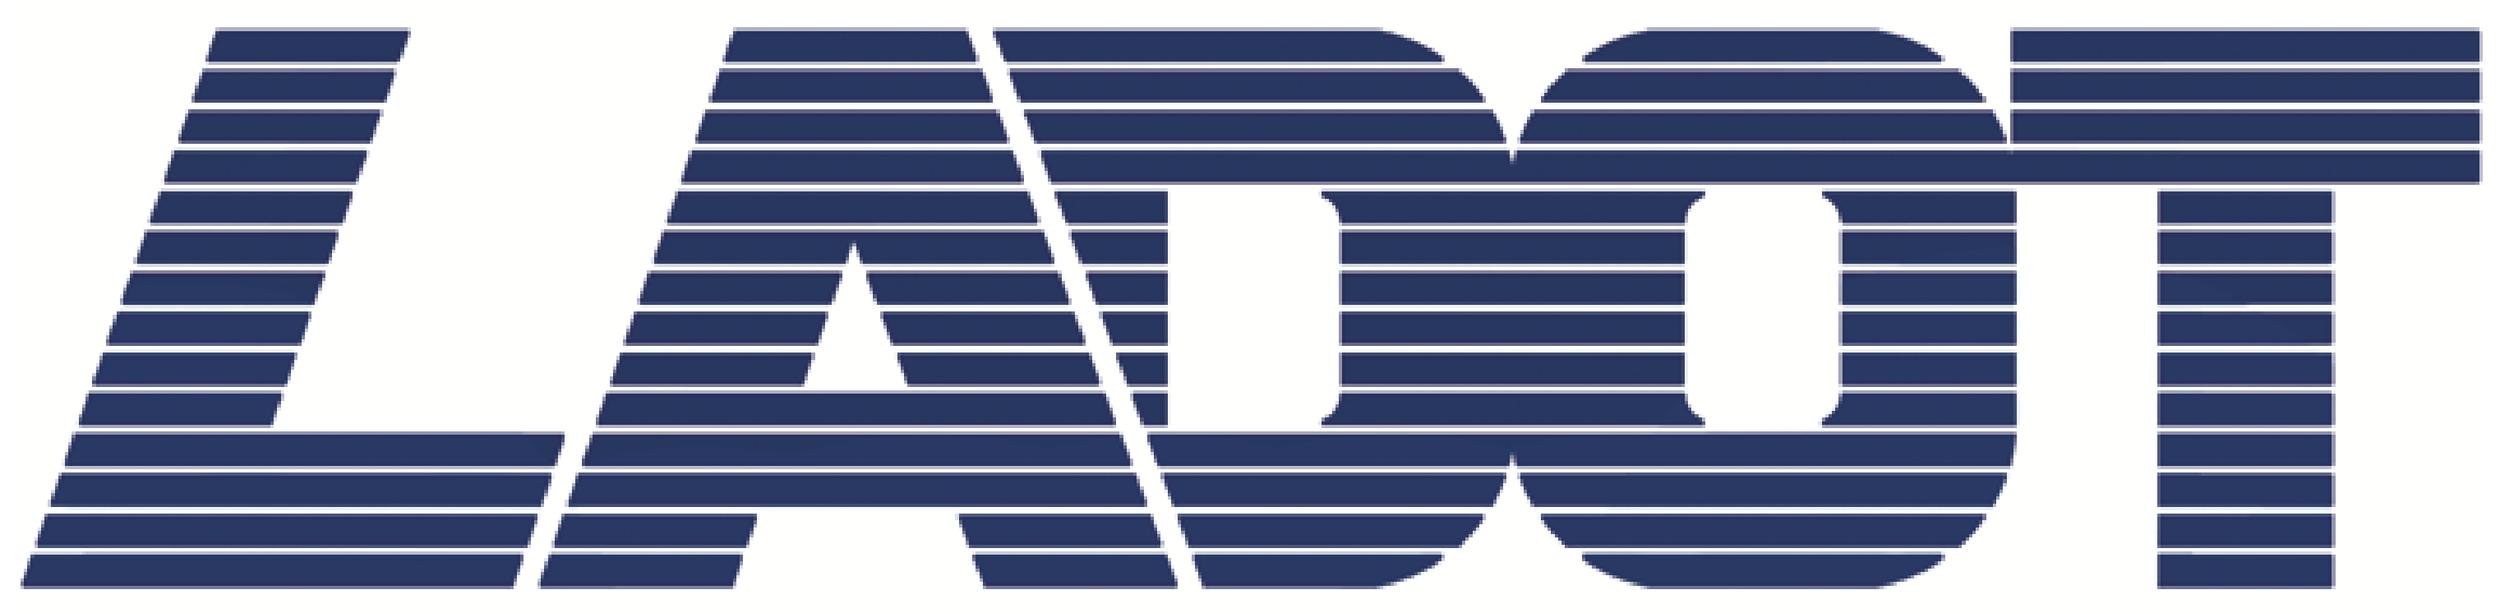 New LADOT Logo.png